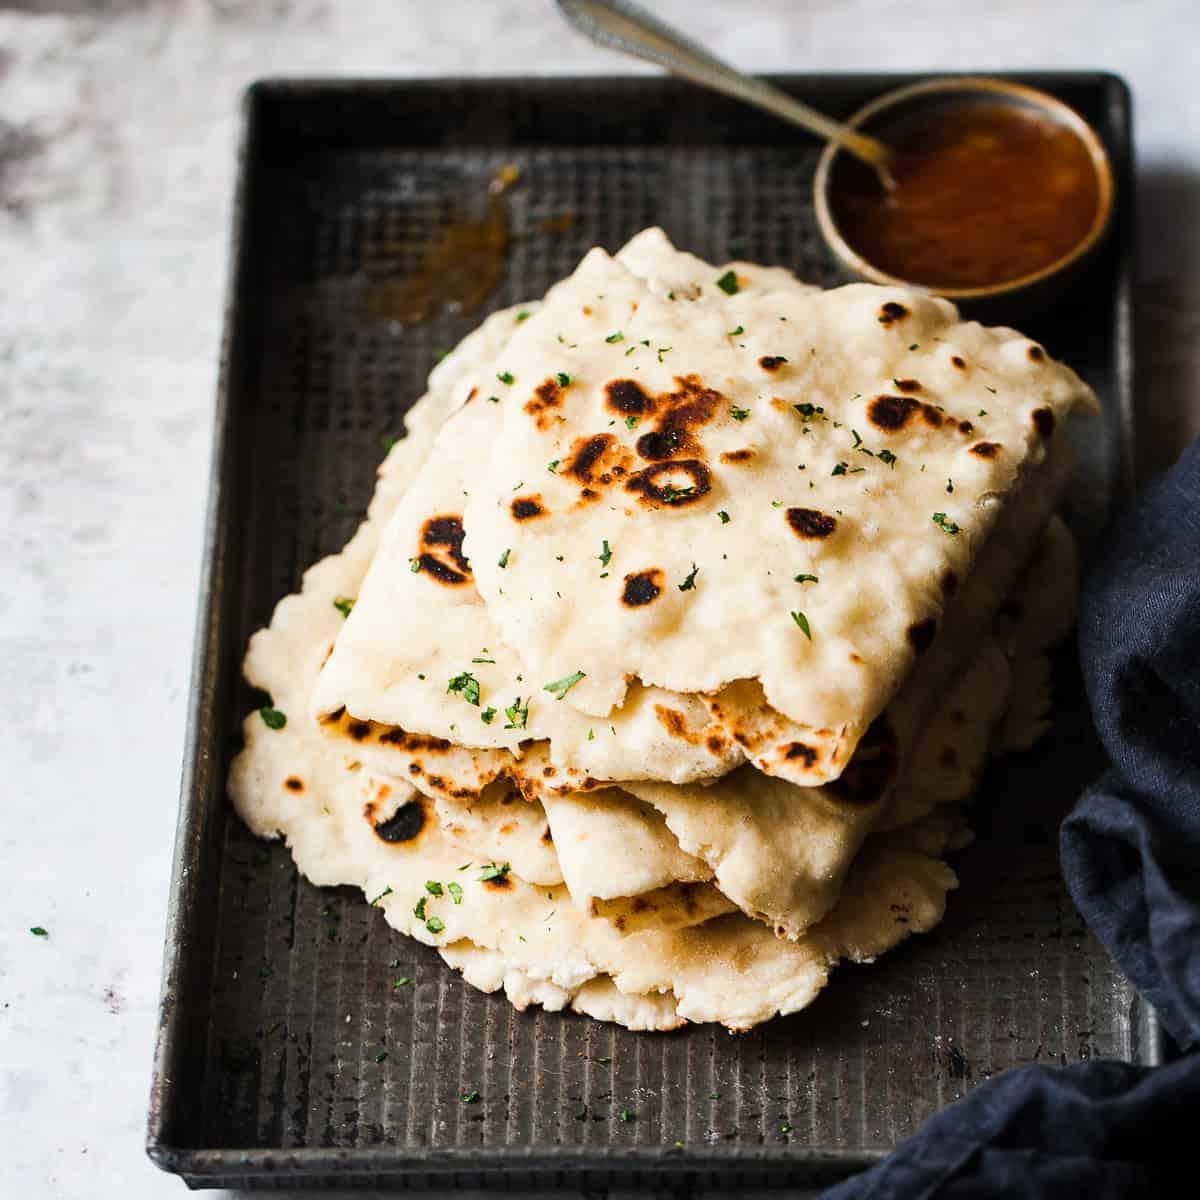 naan bread using only 2 ingredients. Simple yeast free.